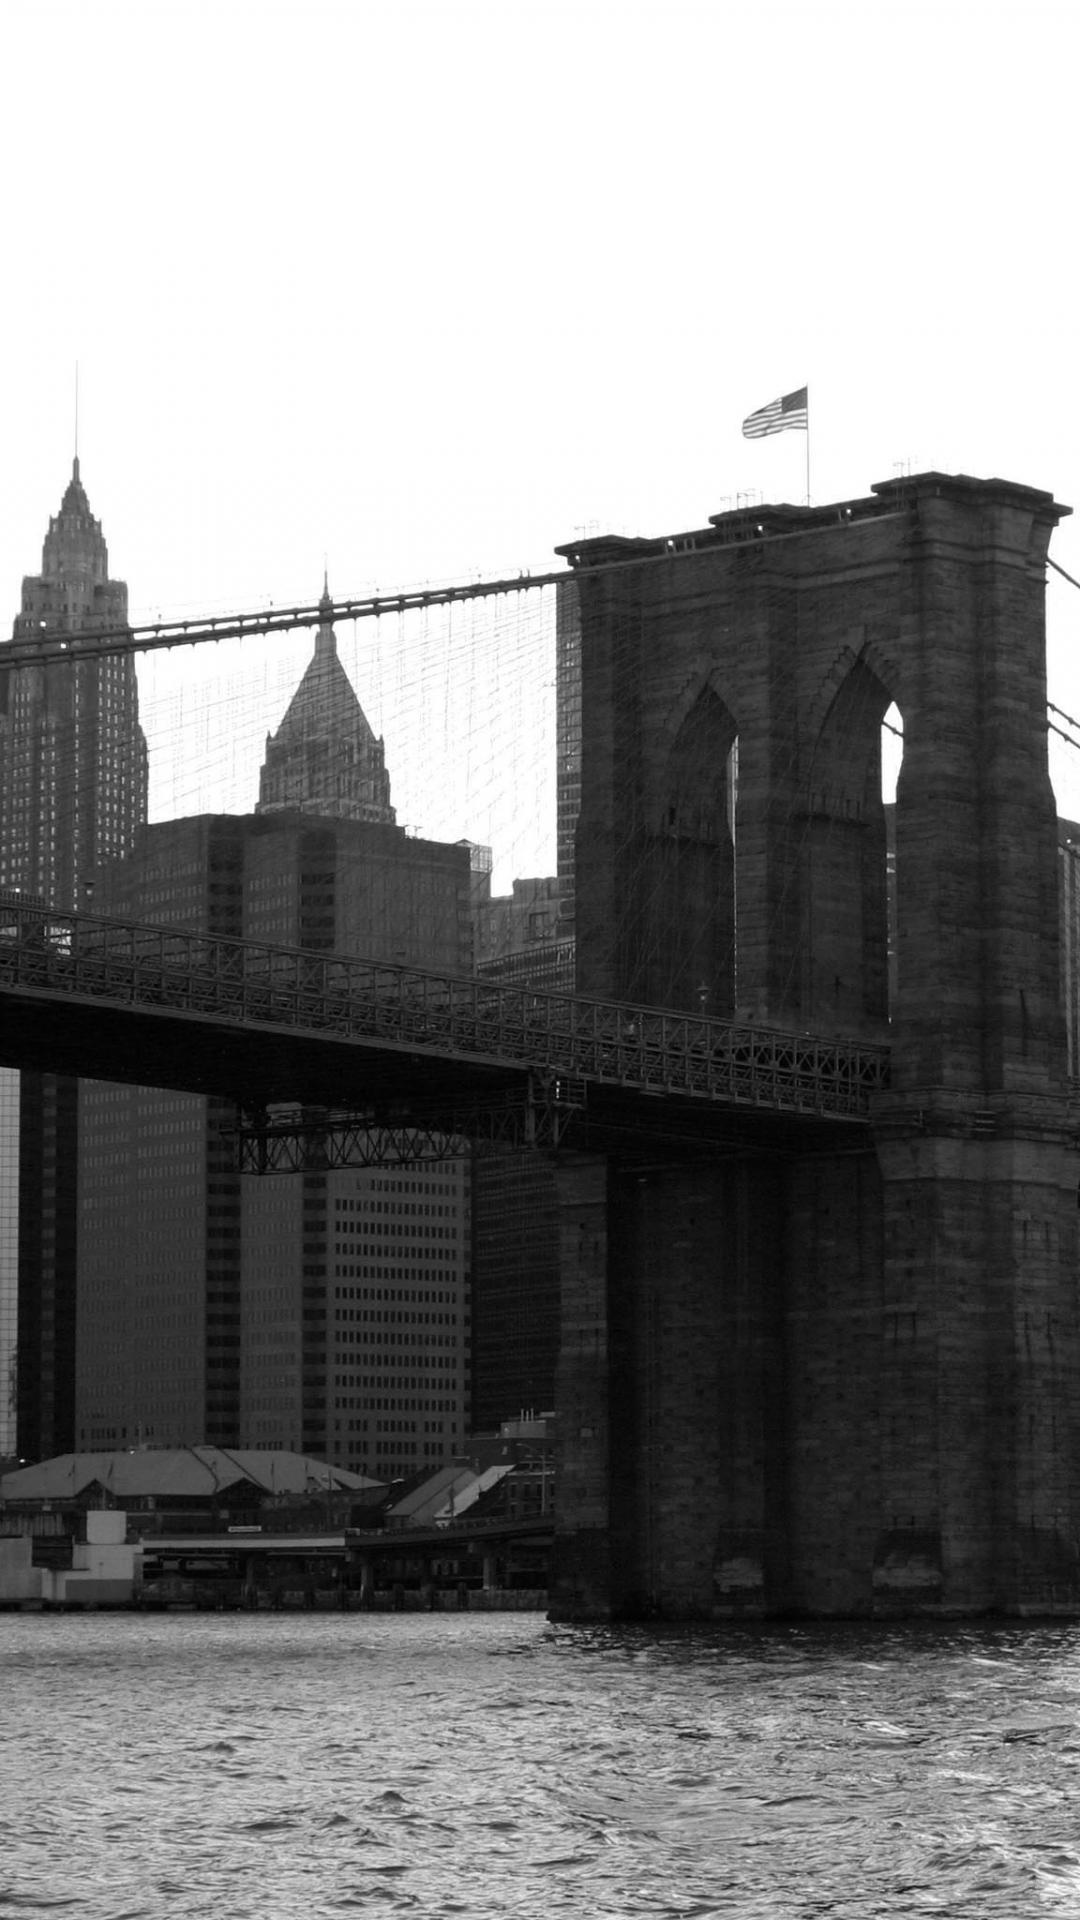 Free Download Brooklyn Bridge Manhattan New York City Bridges Wallpaper Hq Wallpaper 2560x2048 For Your Desktop Mobile Tablet Explore 38 Brooklyn New York Wallpaper Brooklyn Bridge Hd Wallpaper Brooklyn